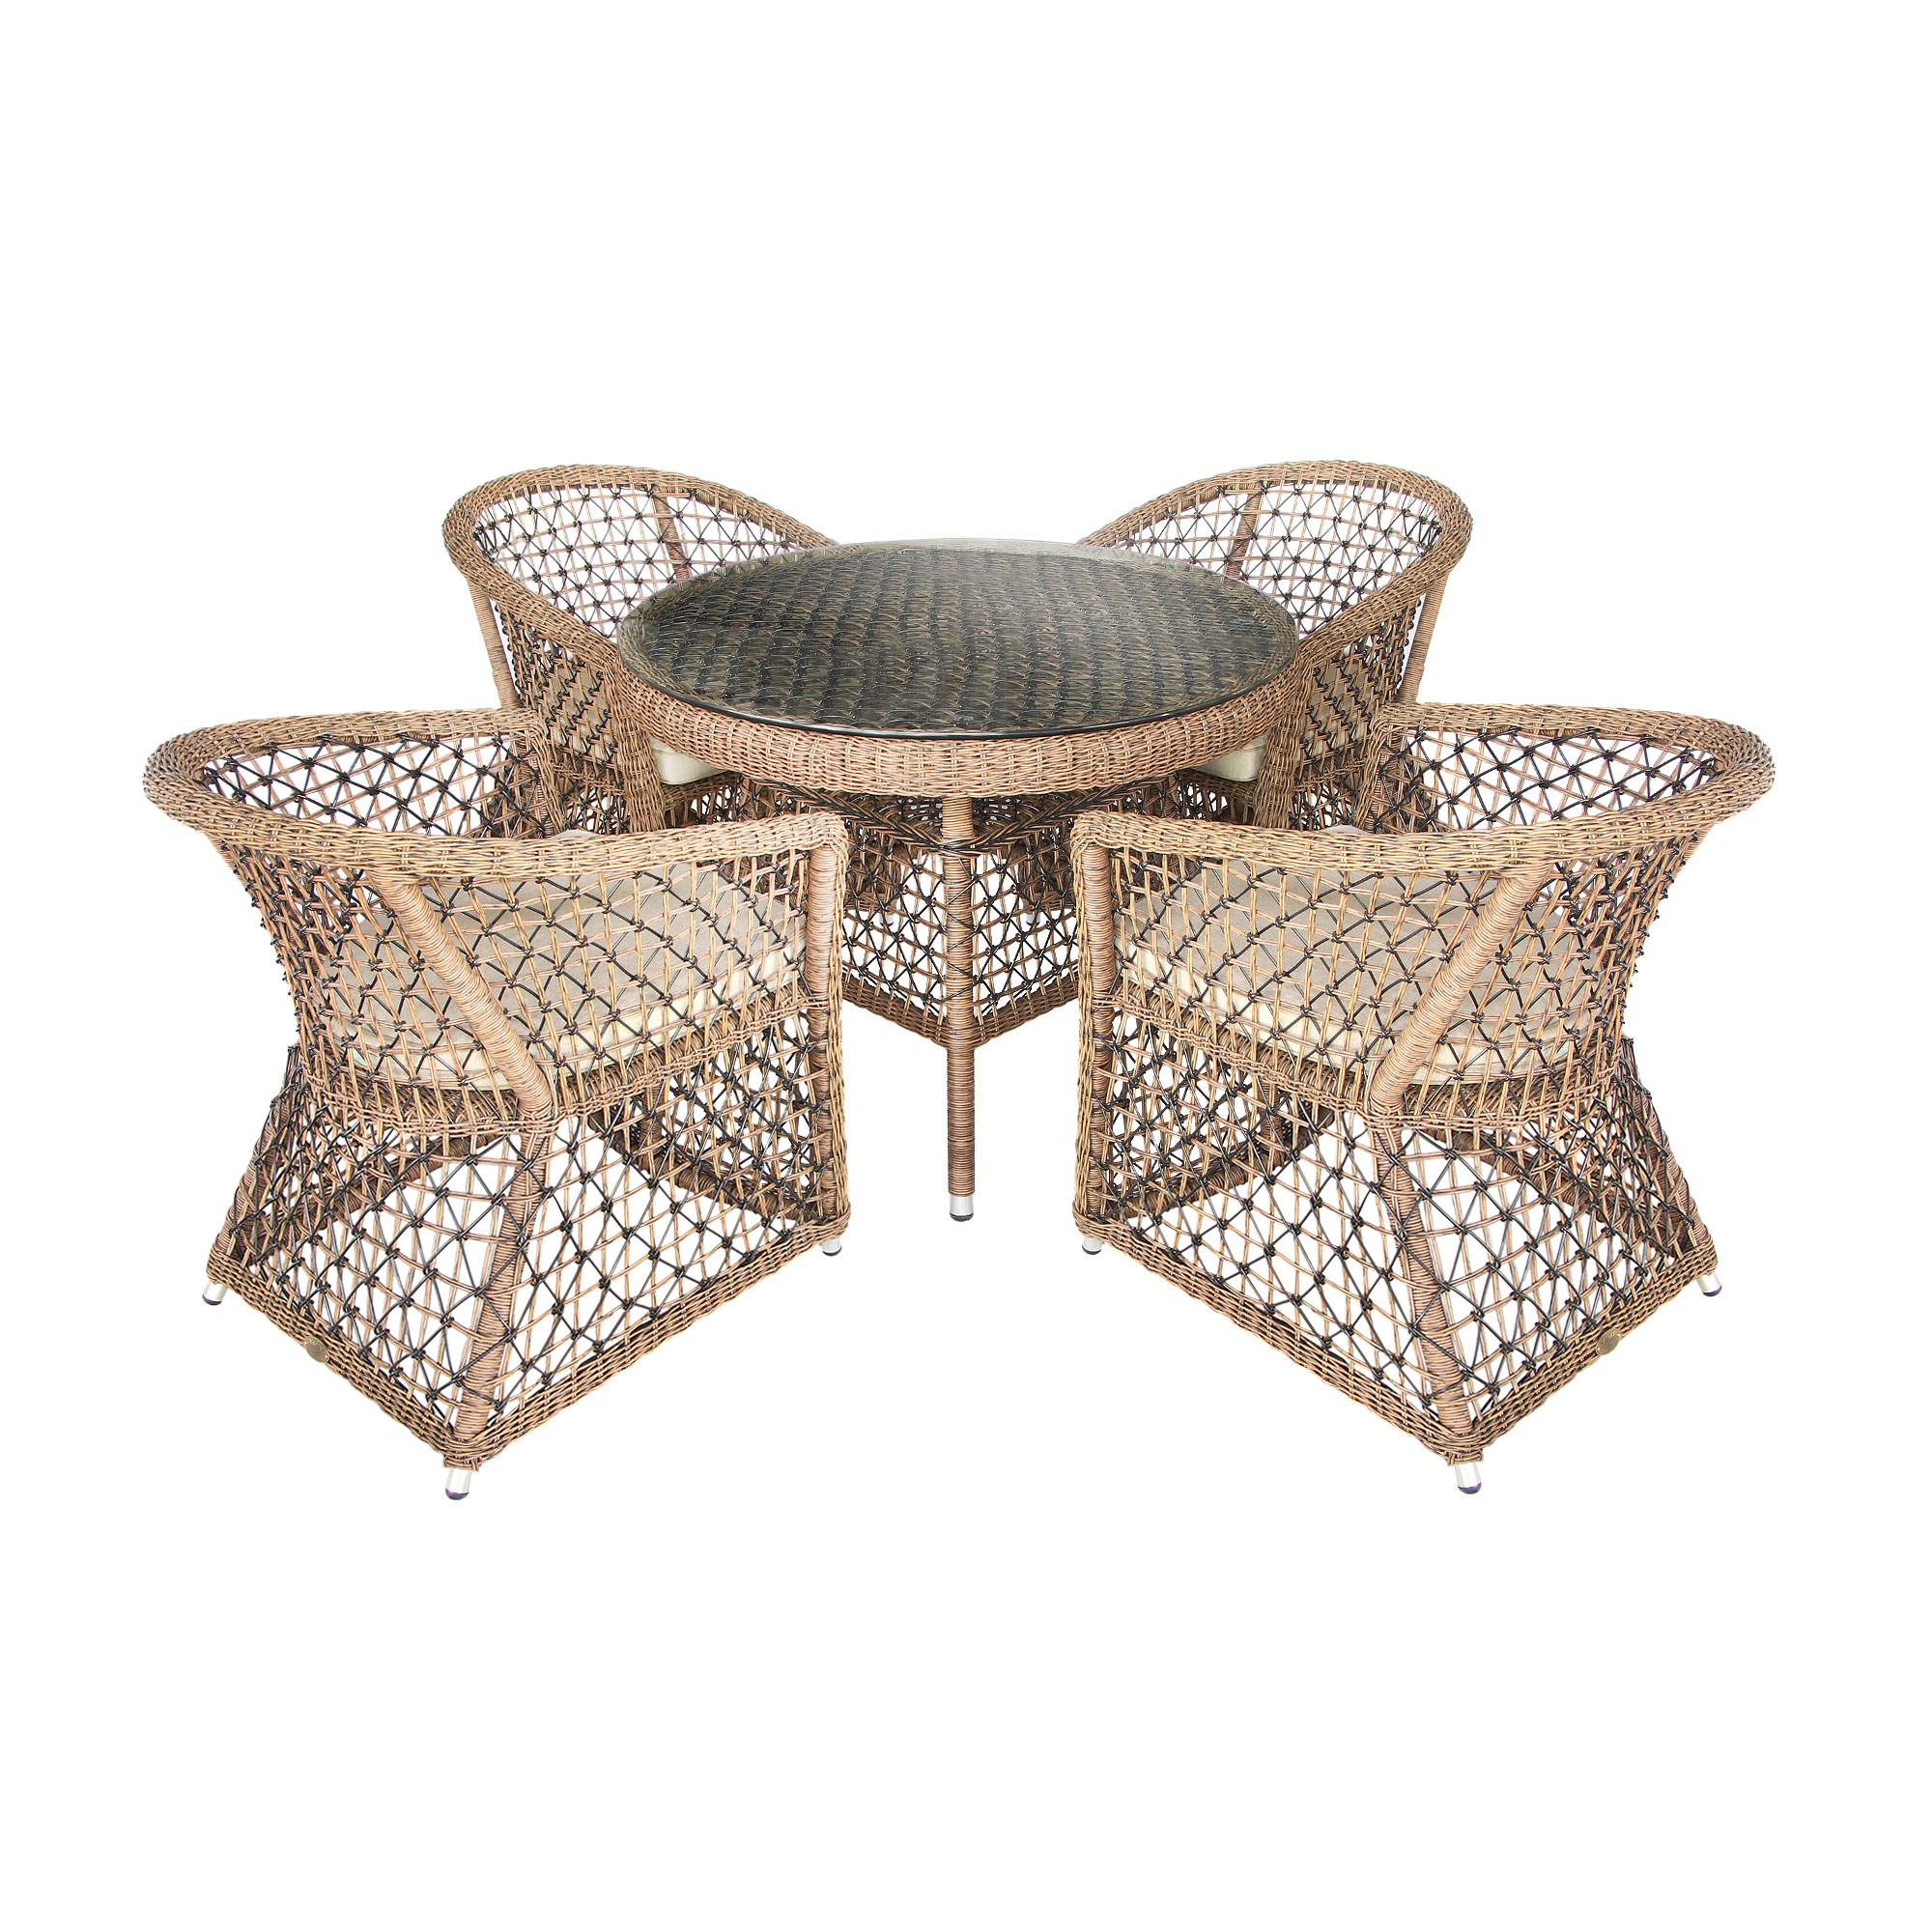 Фото - Комплект мебели Mavi rattan 117-4TCH 5 предметов рубашка mavi 021235 620